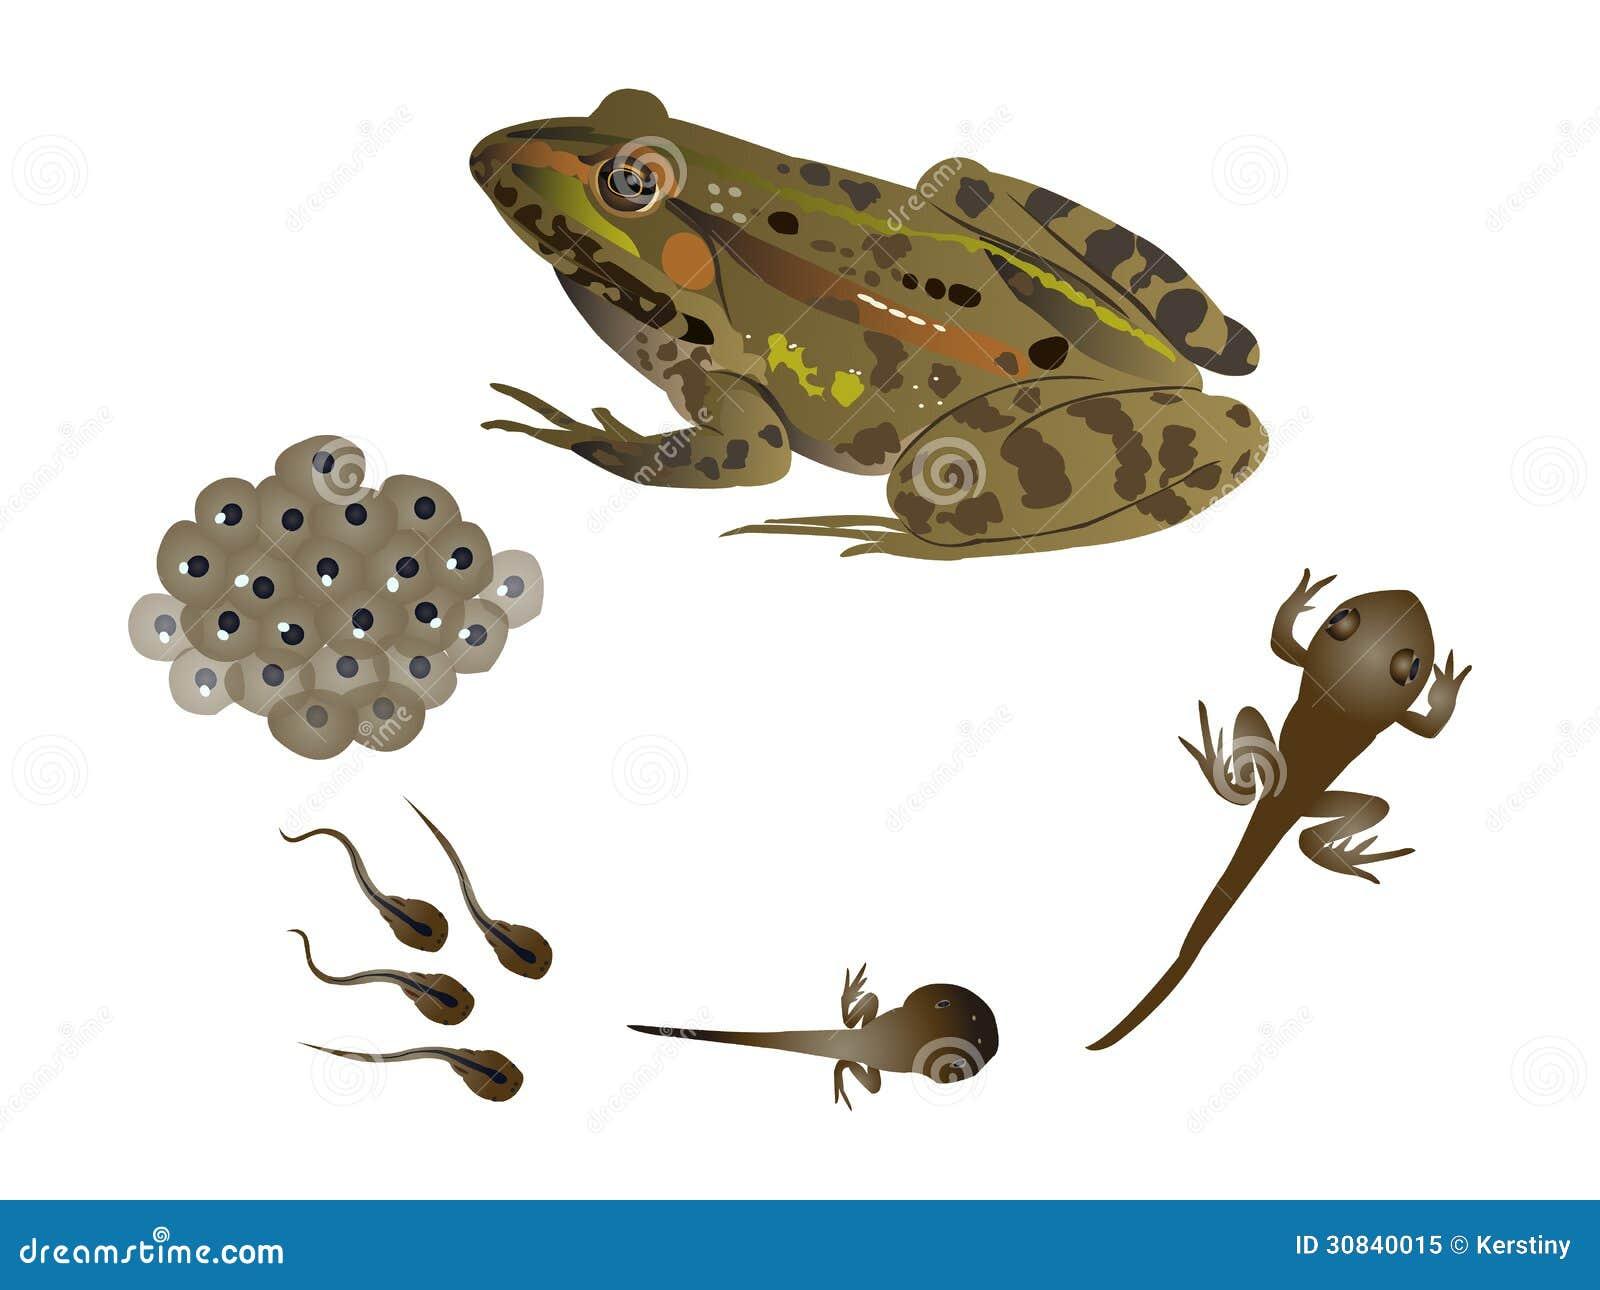 Frog life cycle eggs - photo#25